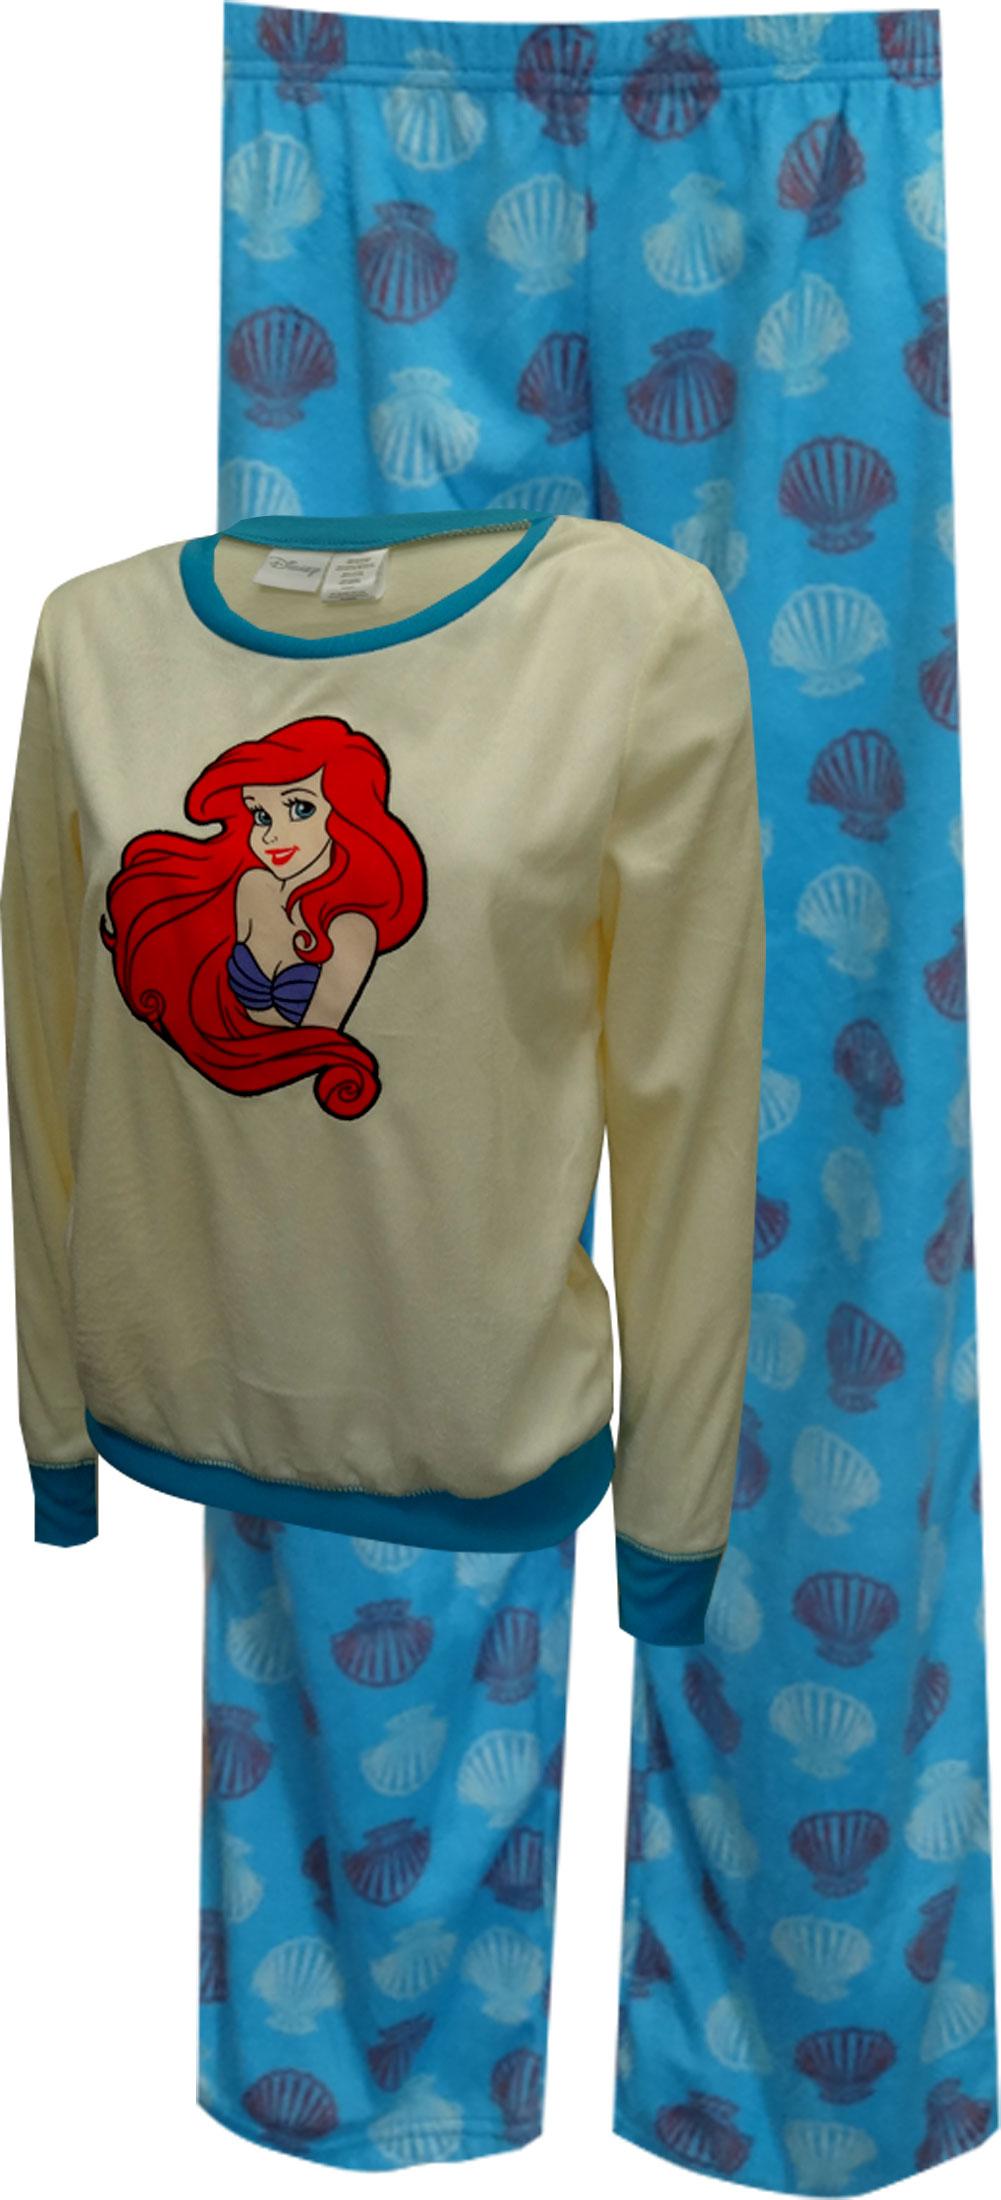 Disney Little Mermaid Princess Ariel Fleece Pajama Set for women